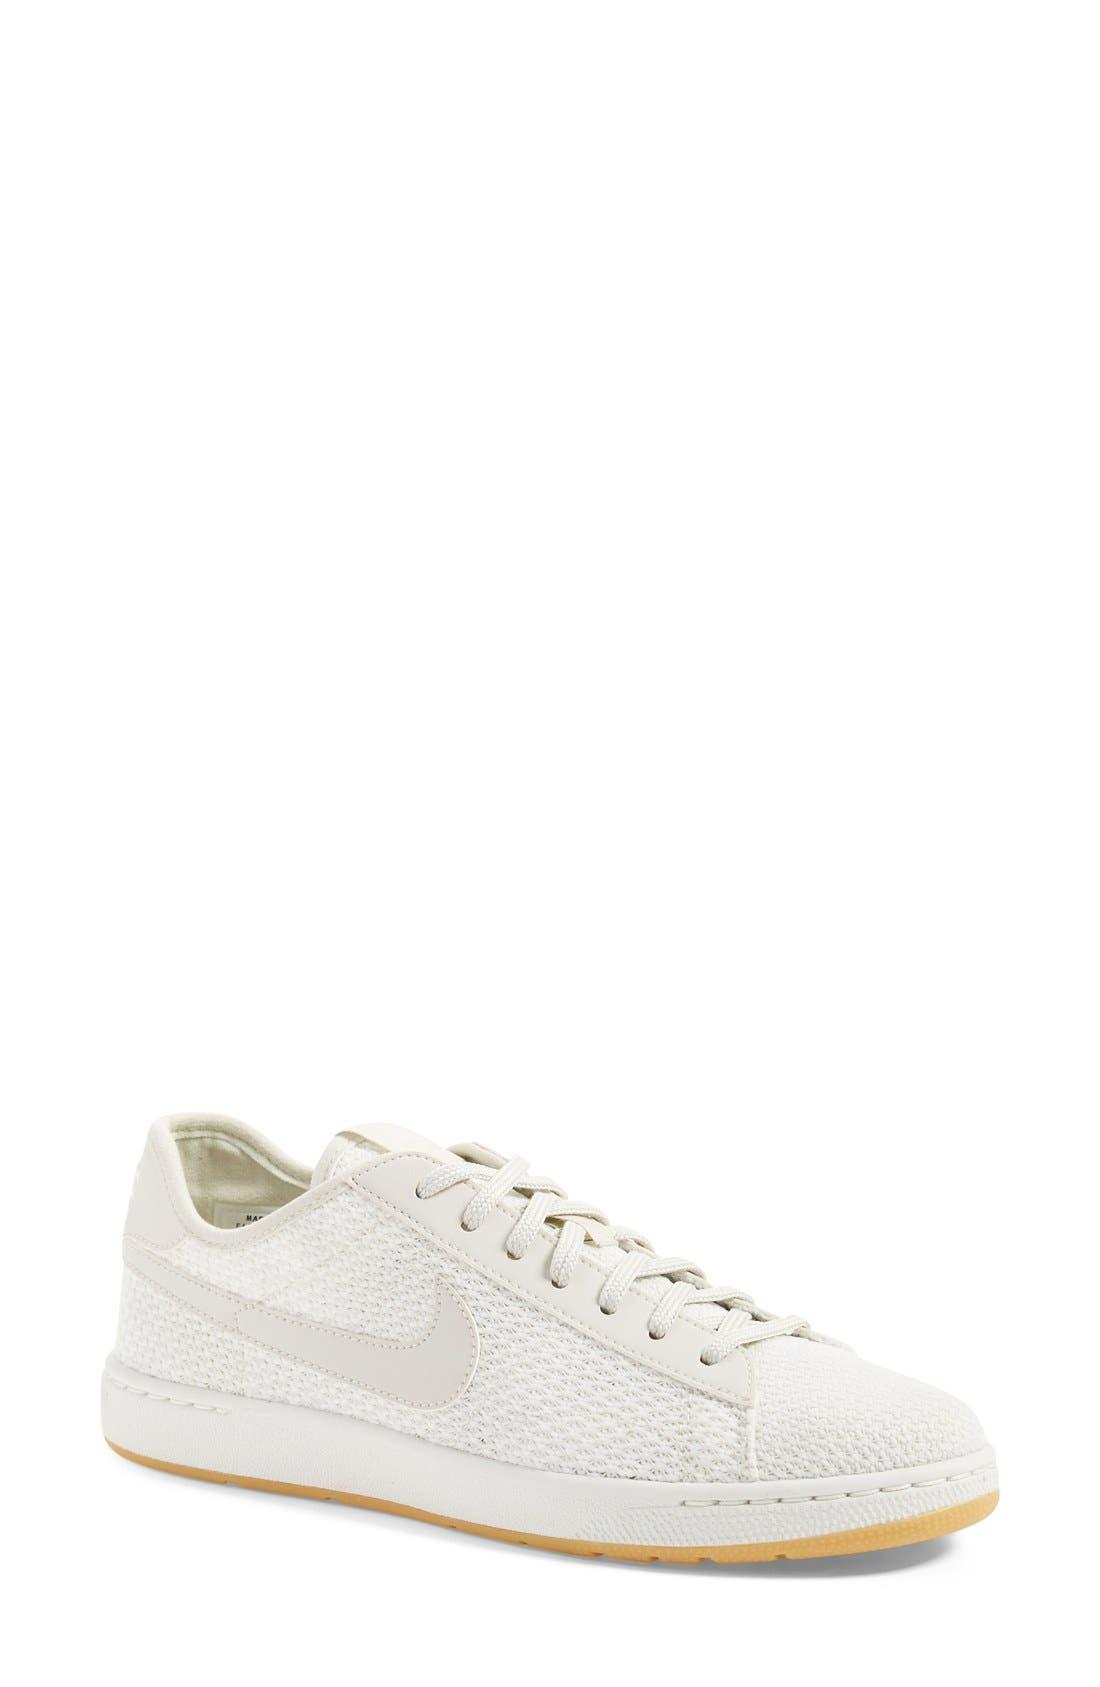 Main Image - Nike 'Tennis Classic Ultra -Textile' Sneaker (Women)